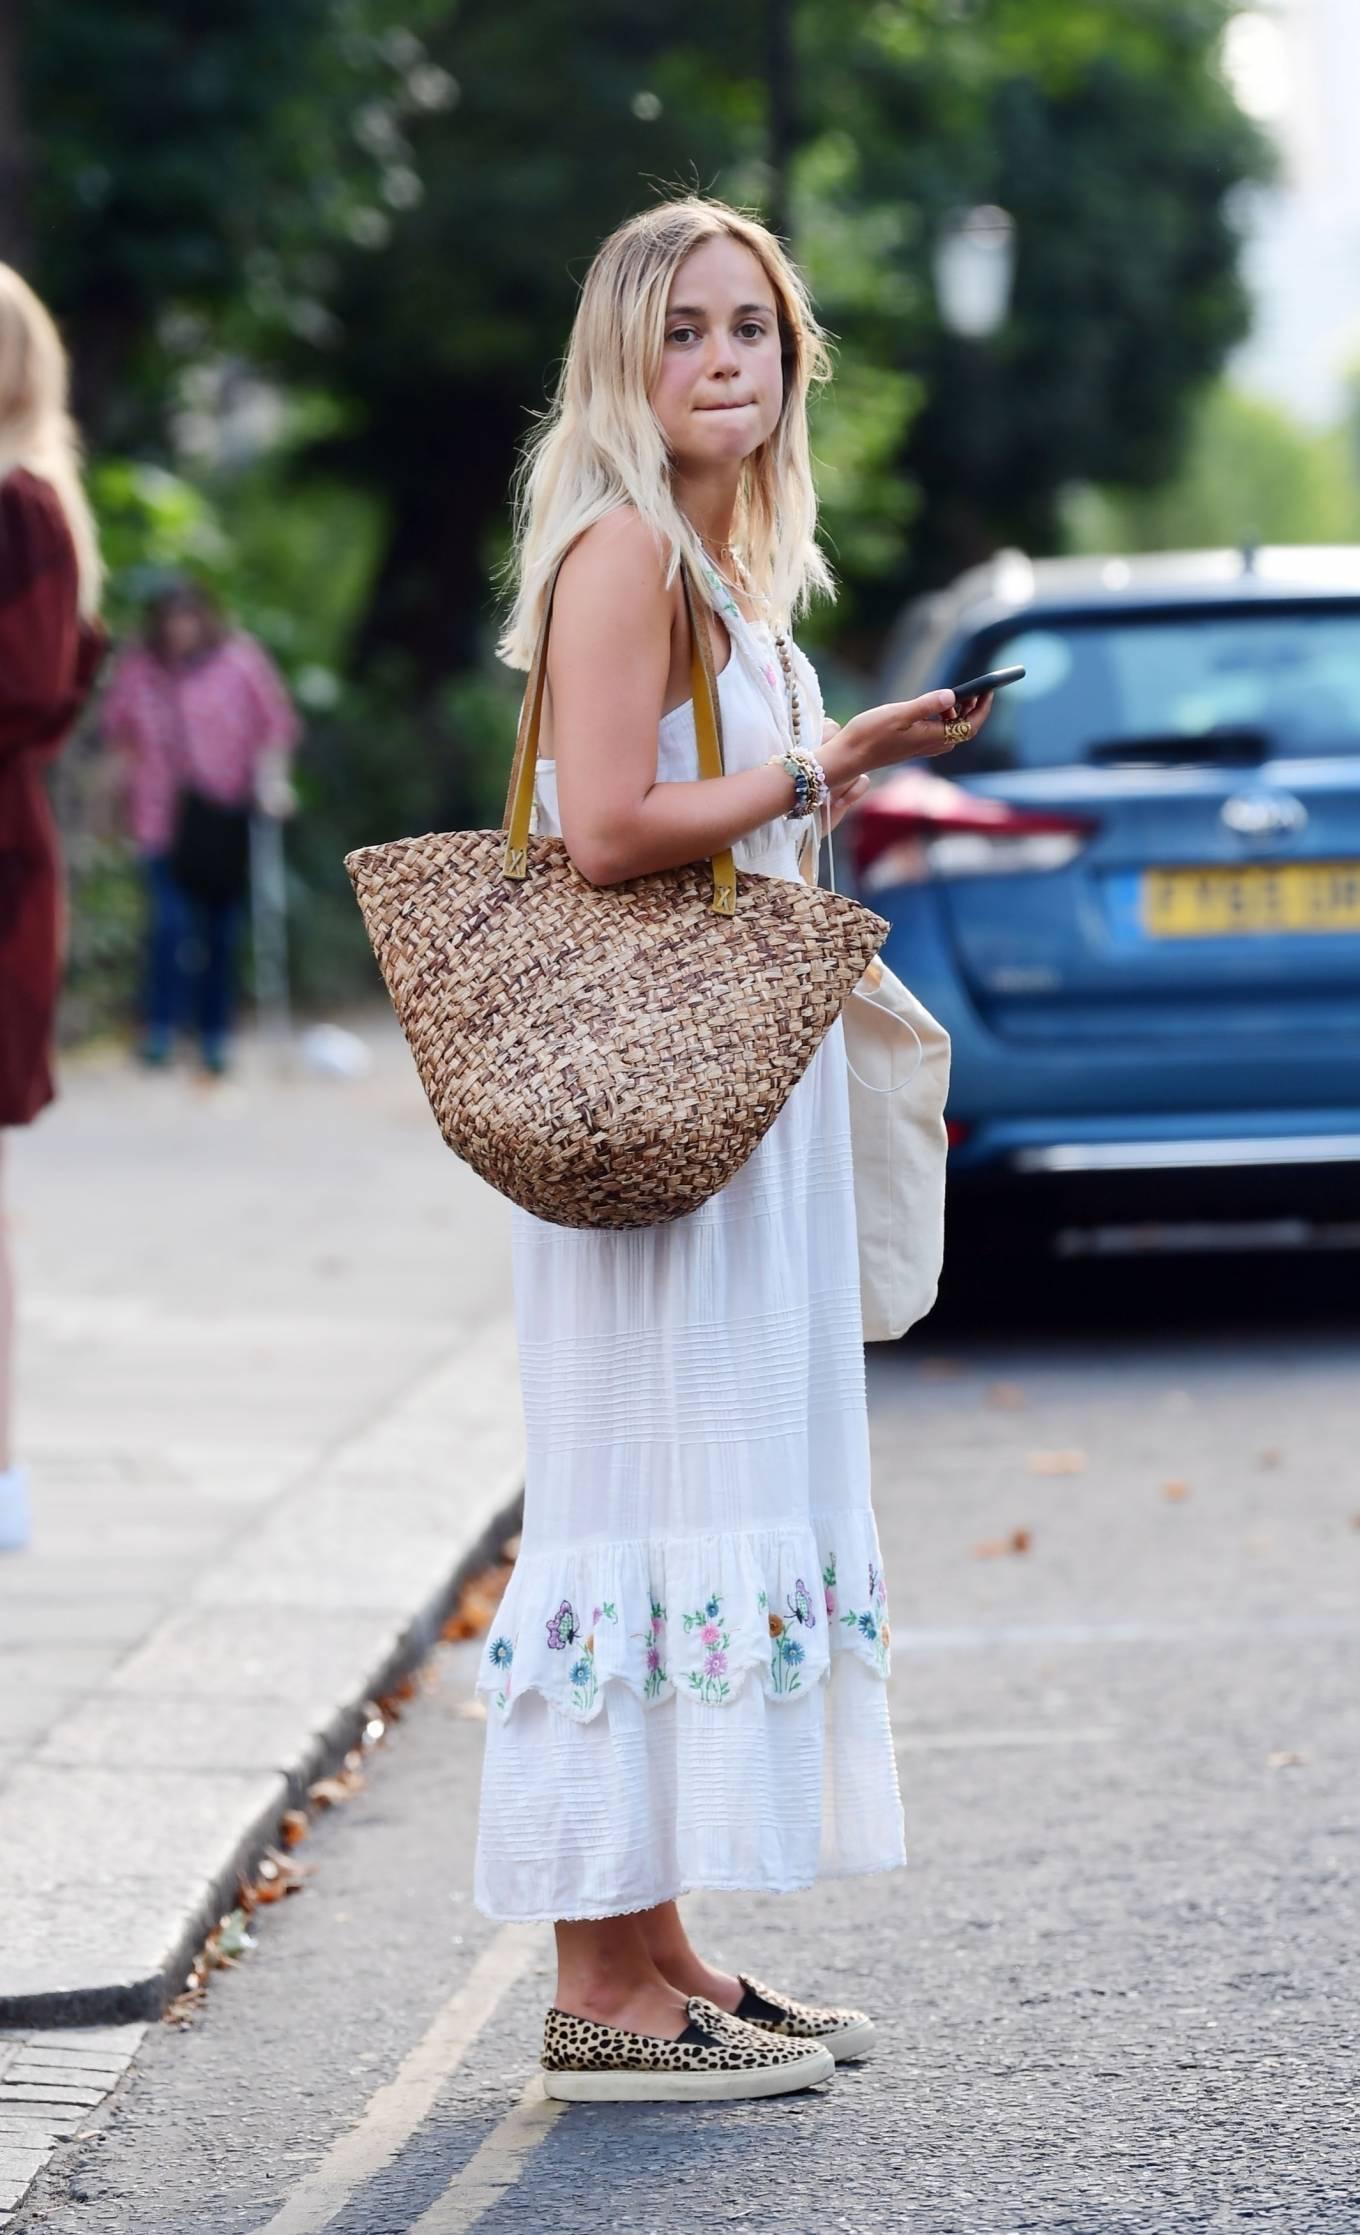 Amelia Windsor 2020 : Amelia Windsor – Looks stunning in a white summery dress in London-03